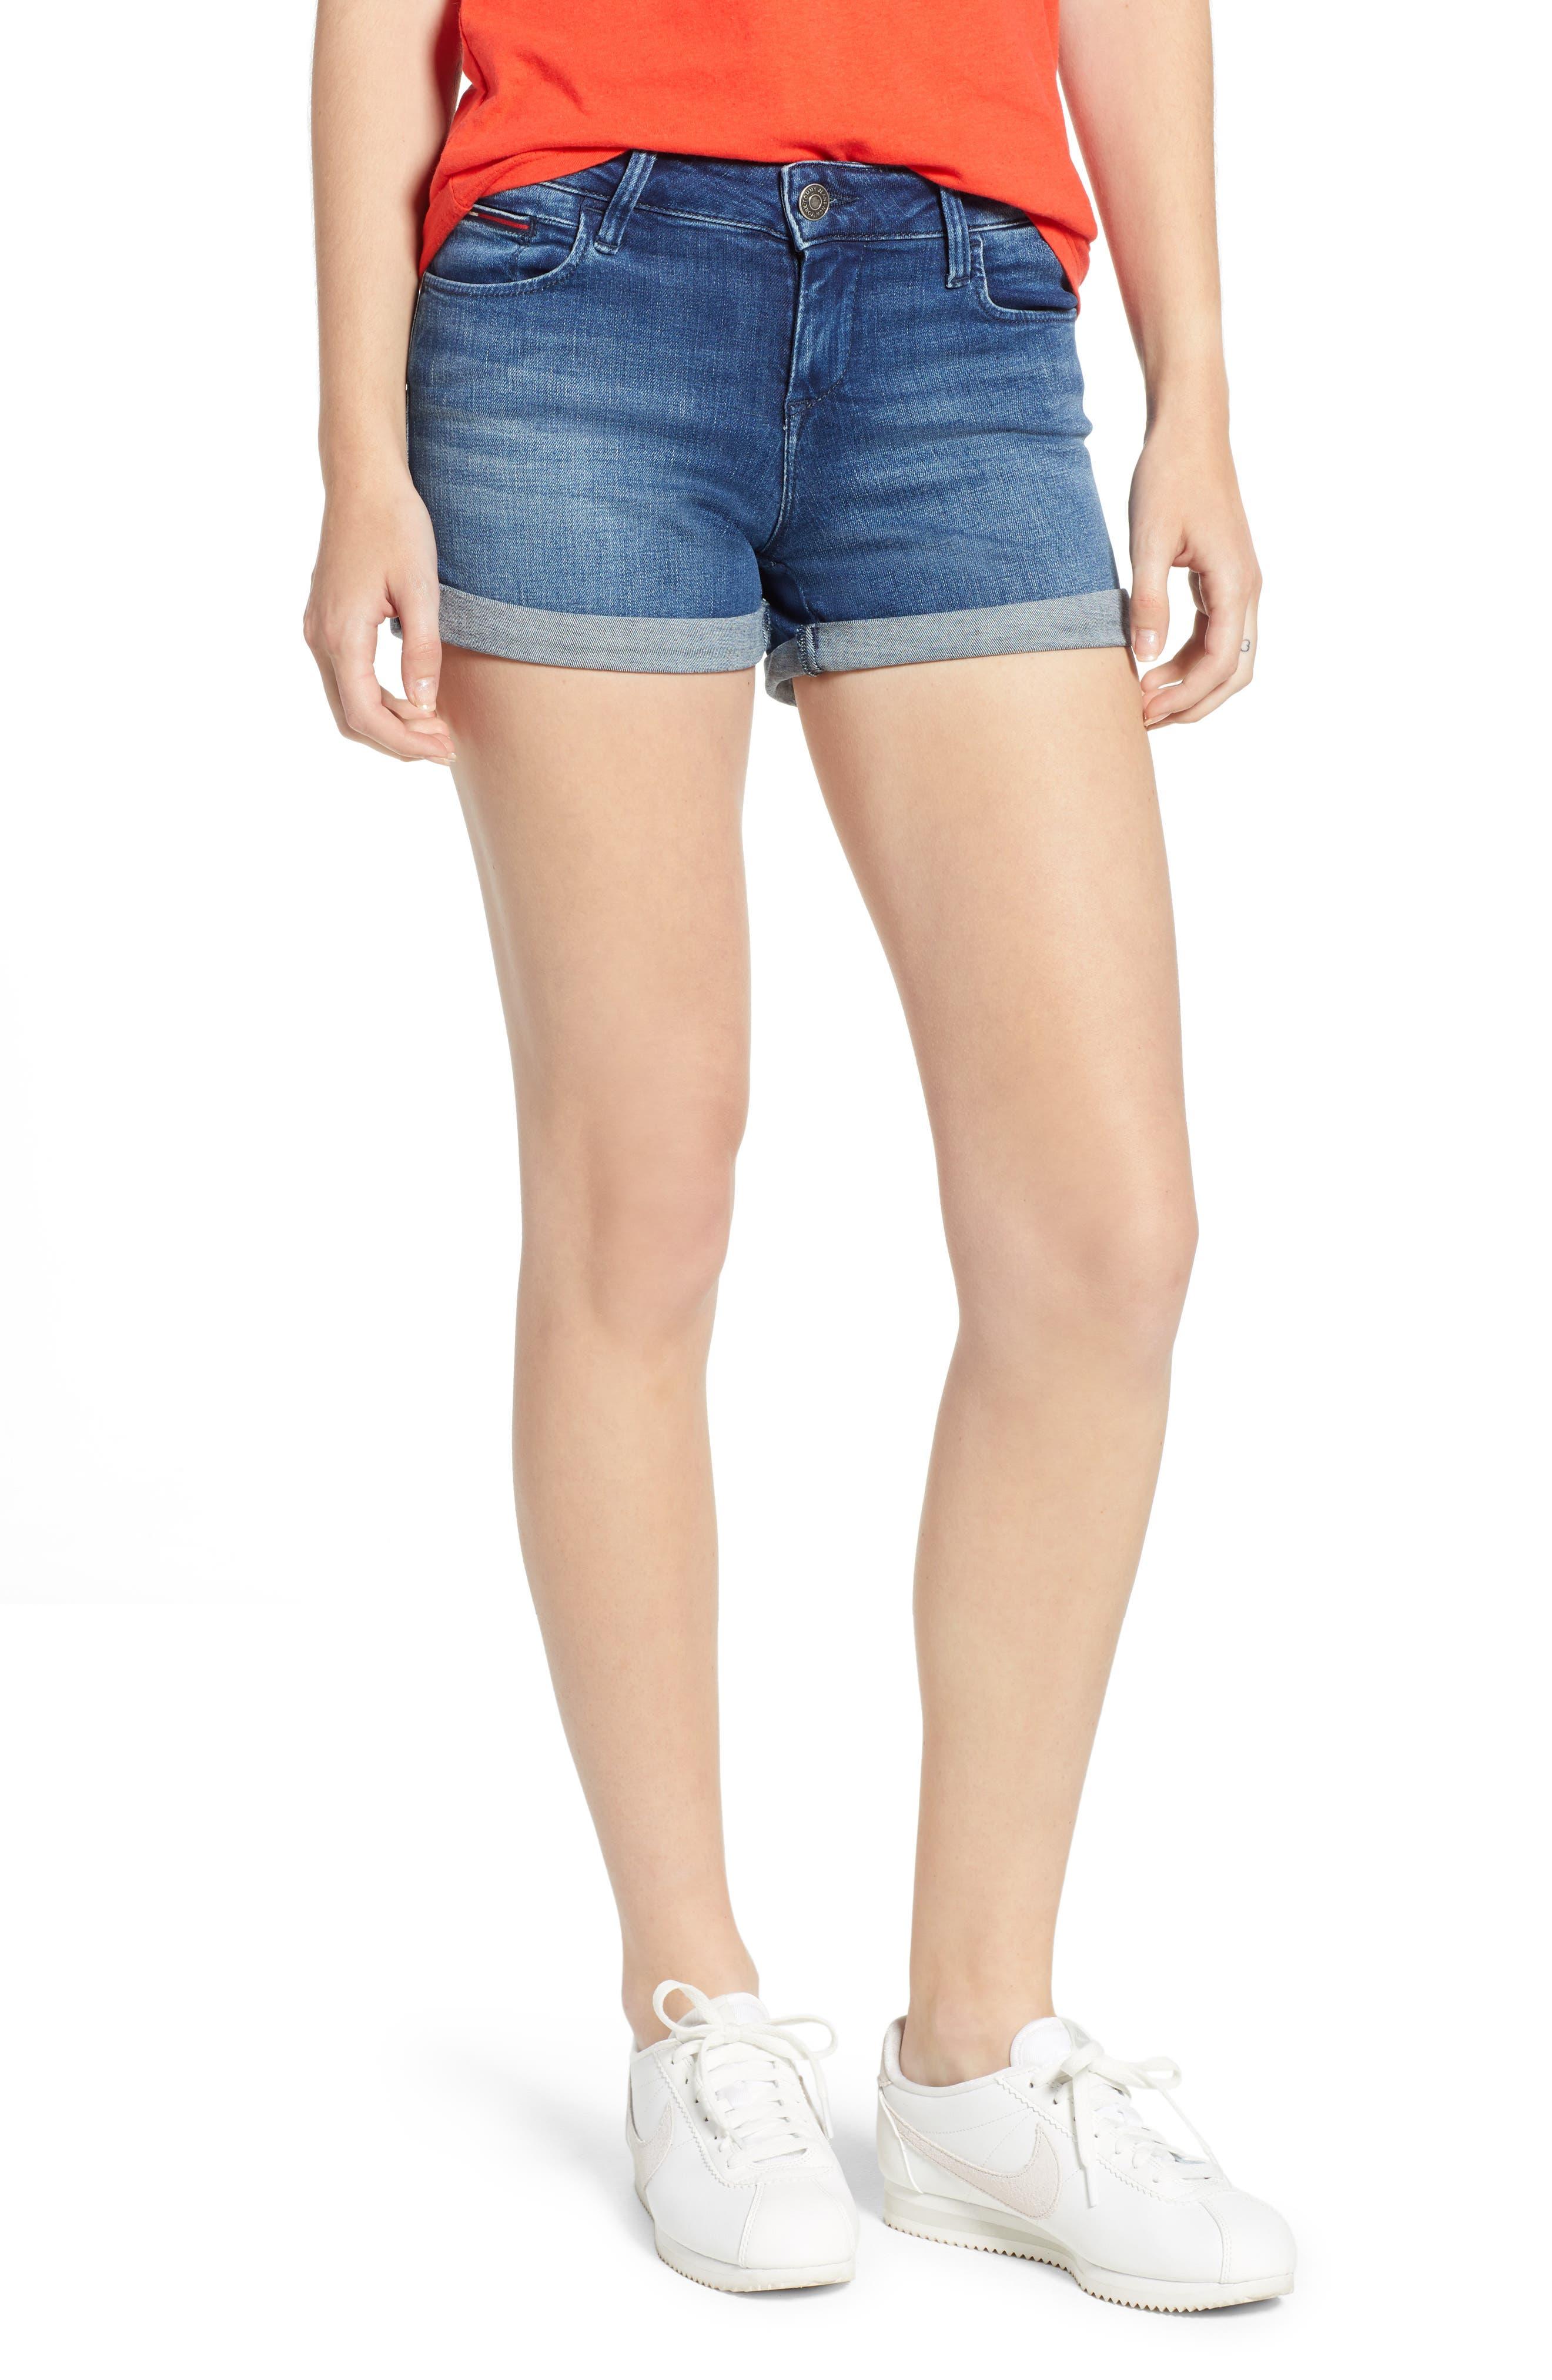 TJW Denim Shorts,                             Main thumbnail 1, color,                             Newport Blue